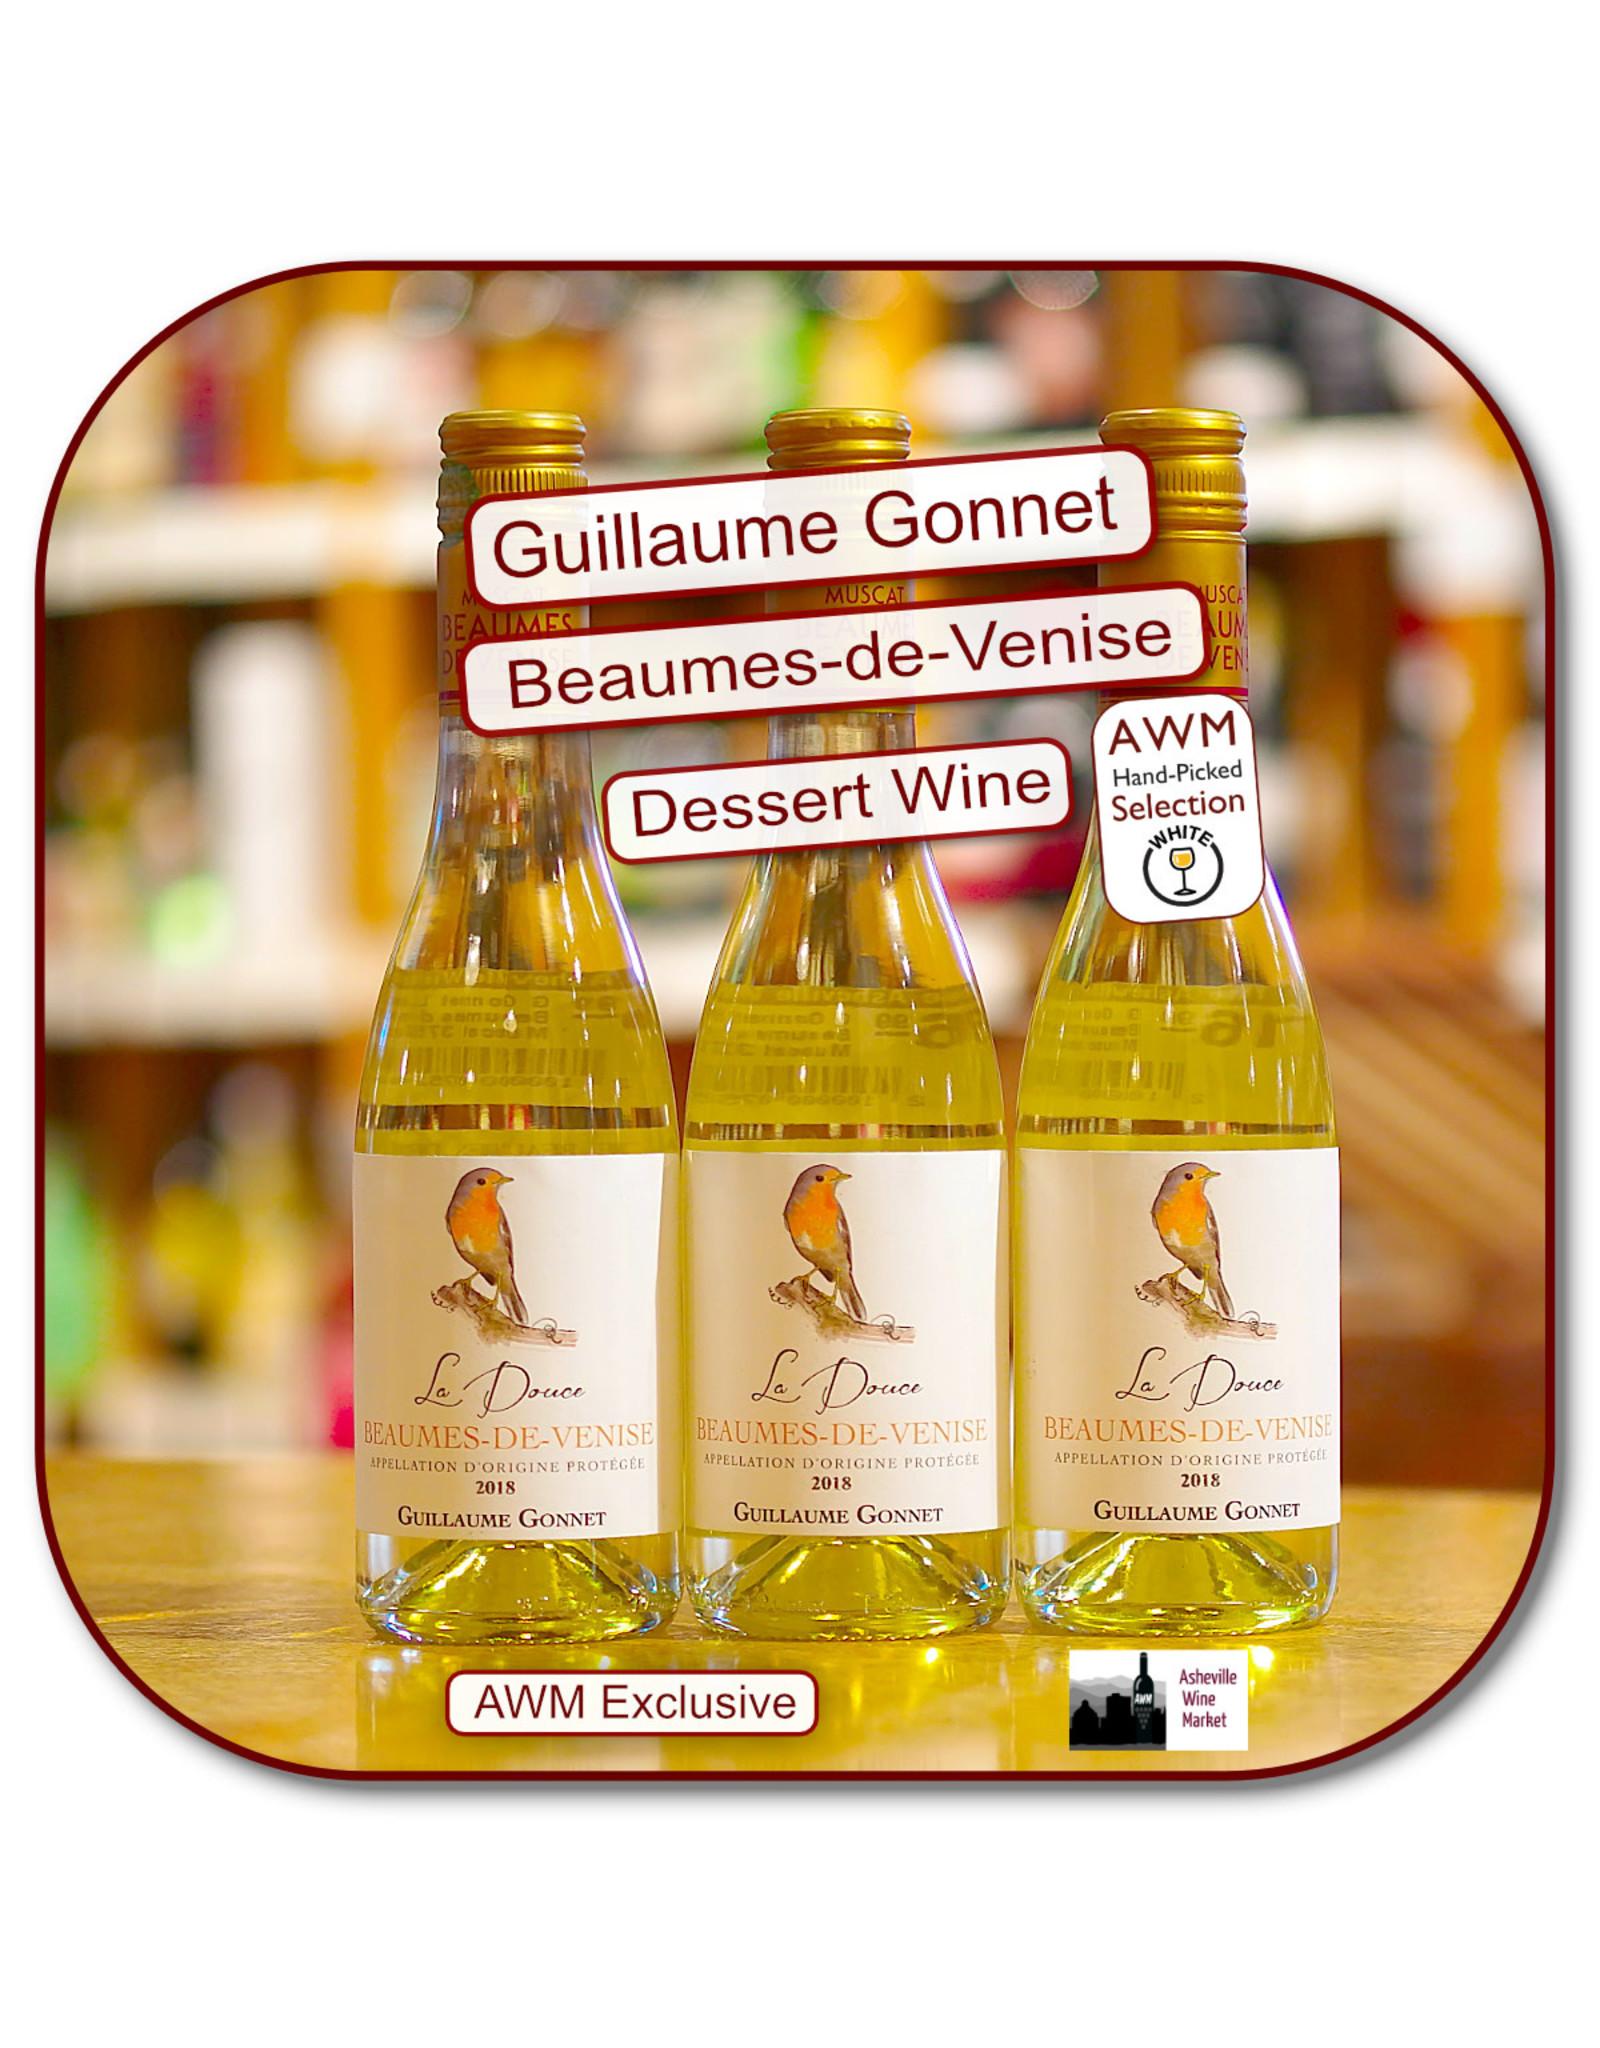 Dessert - Fortified G Gonnet La Douce Beaumes de Venise Sweet Muscat 375ml